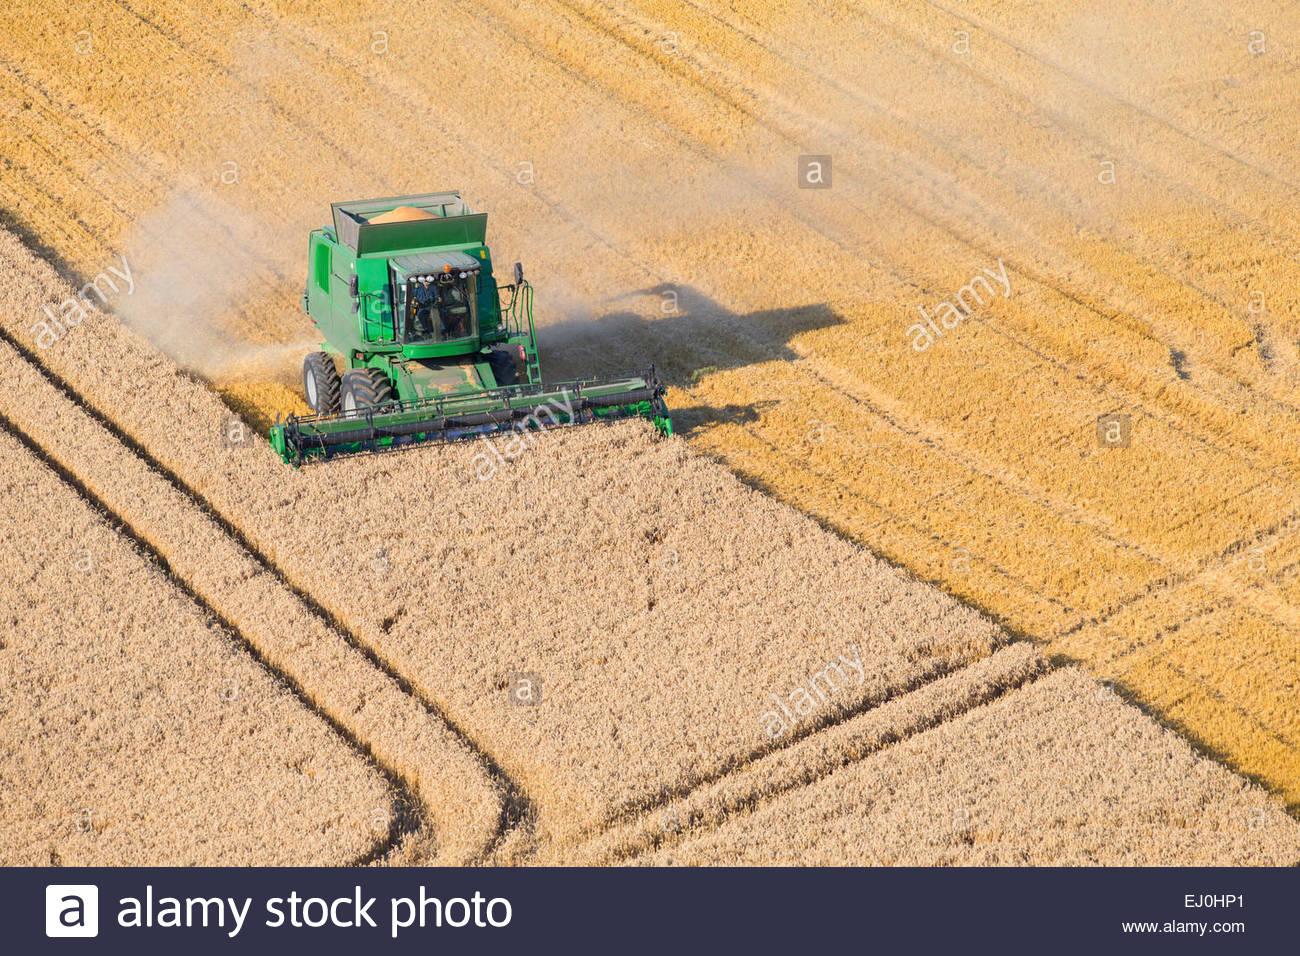 Combine harvester, harvesting wheat in rural field Stock Photo